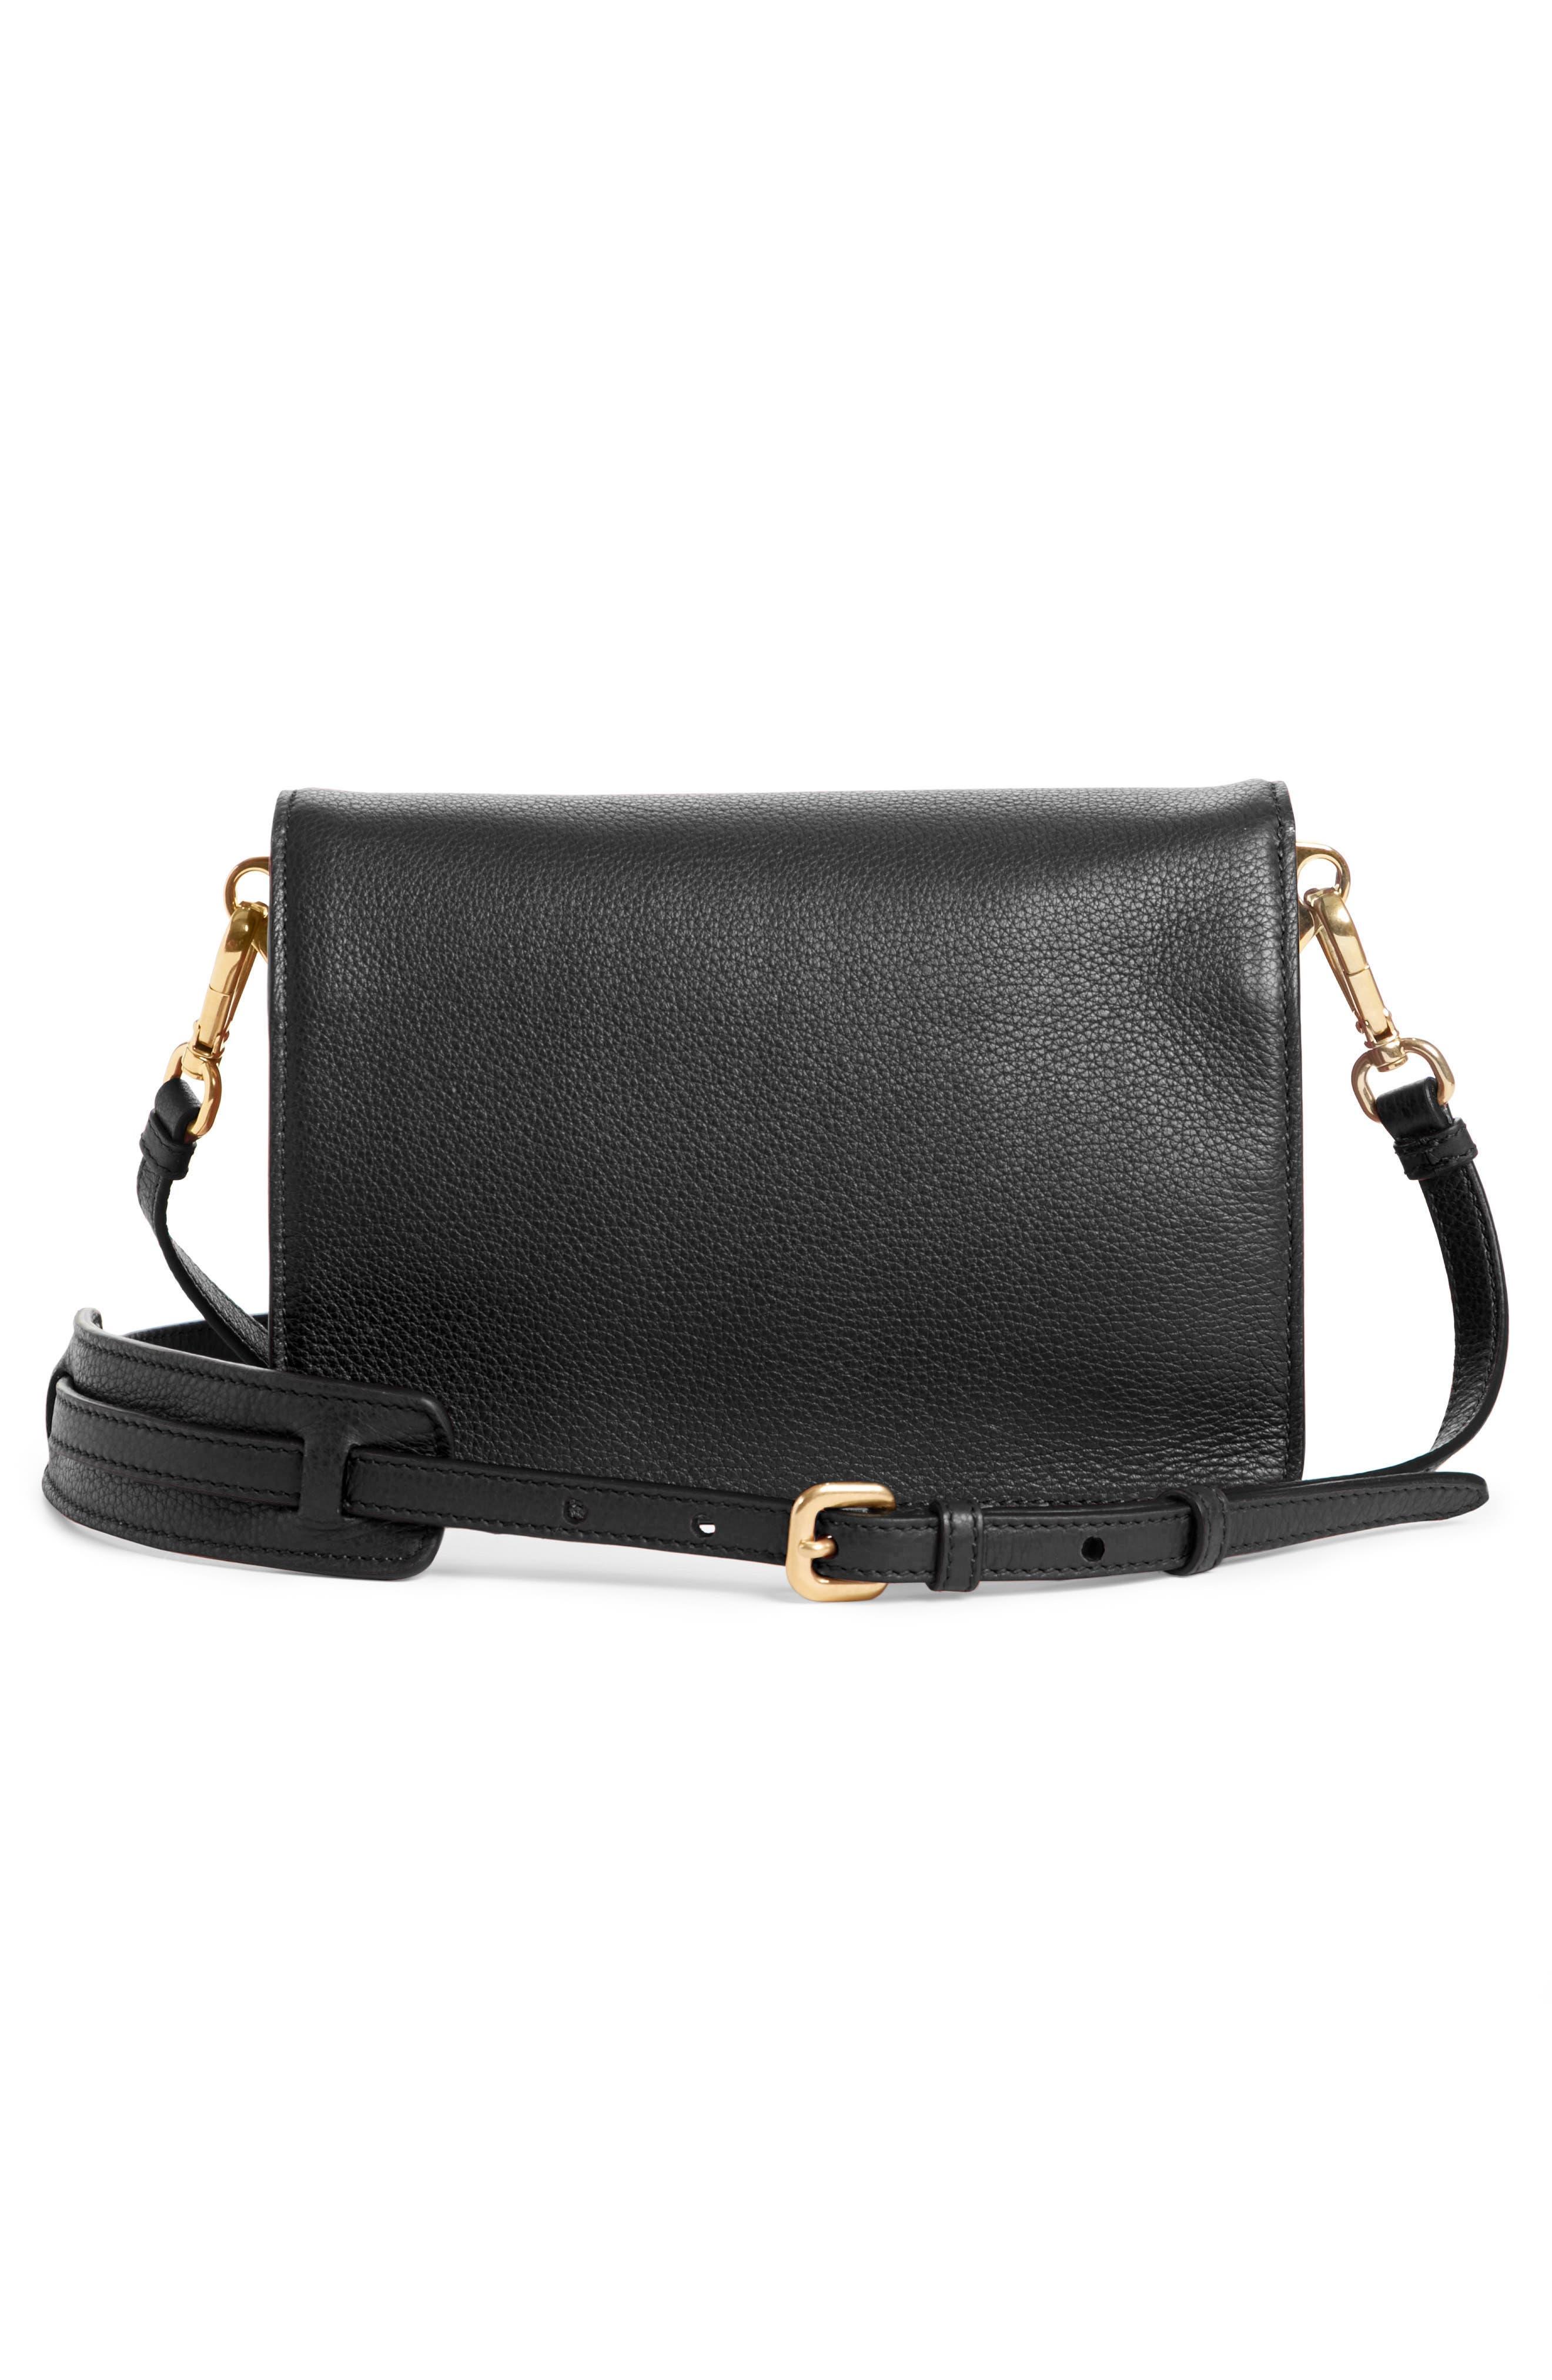 Vitello Daino Double Compartment Leather Shoulder Bag,                             Alternate thumbnail 3, color,                             001